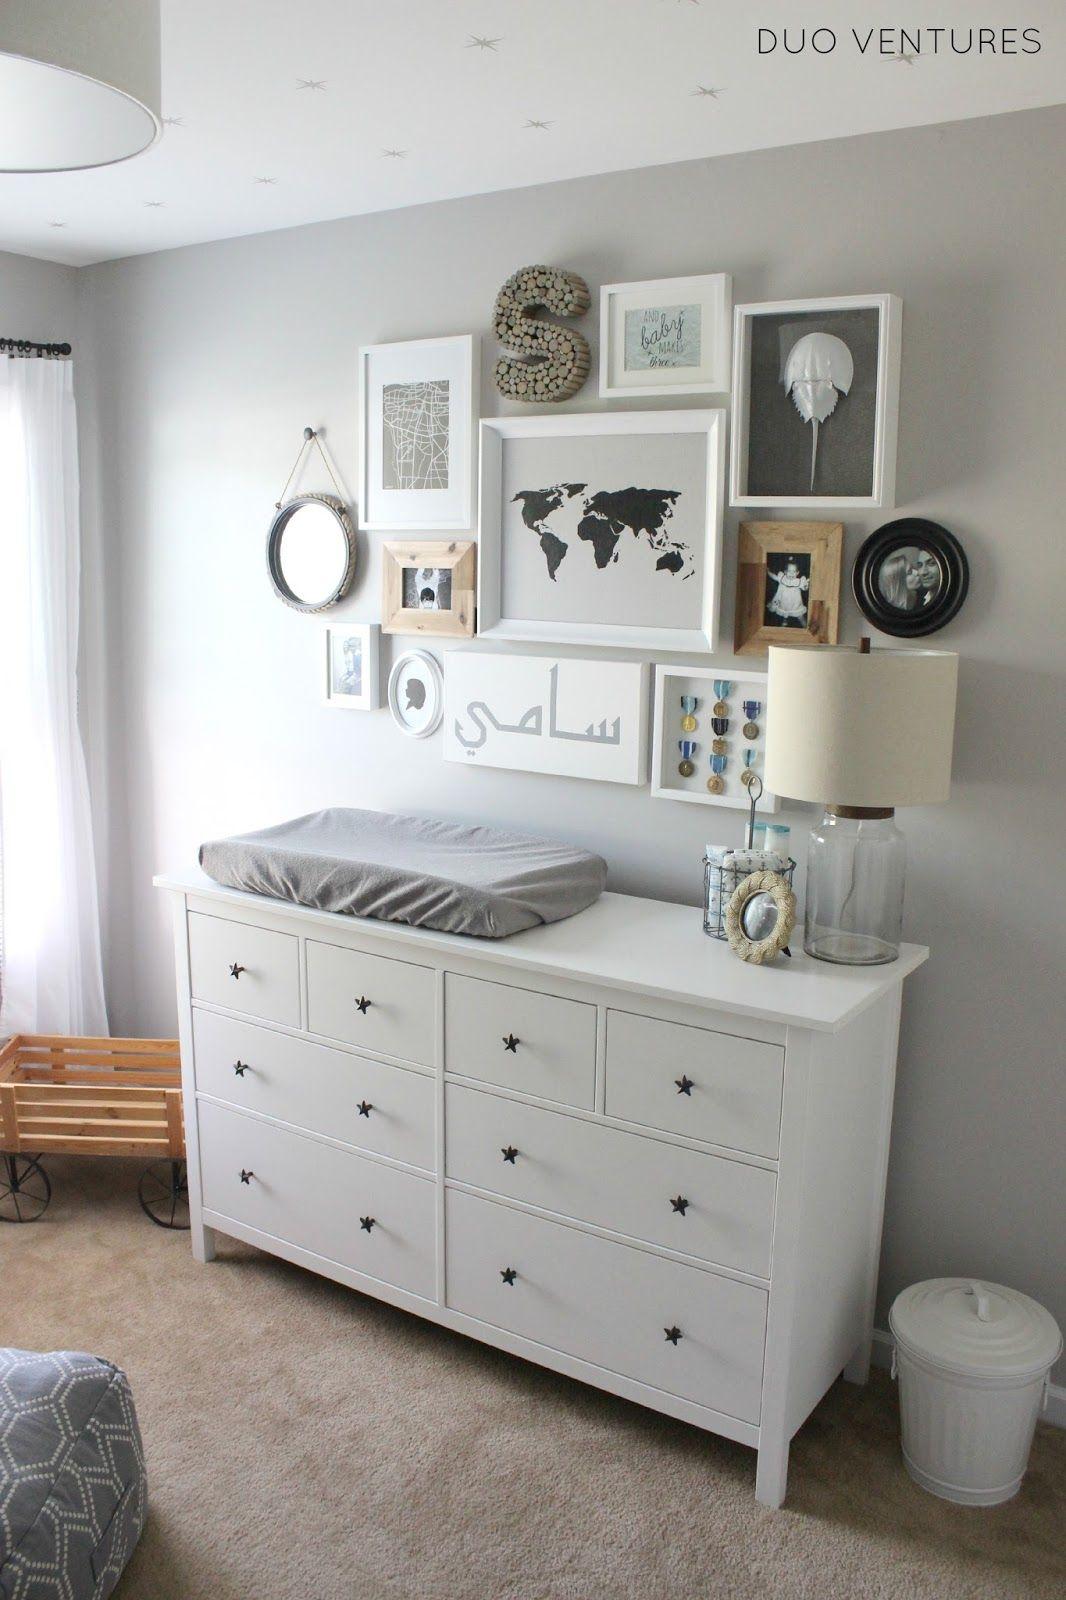 duo ventures: the nursery: custom ikea hemnes dresser | nursery, Deco ideeën